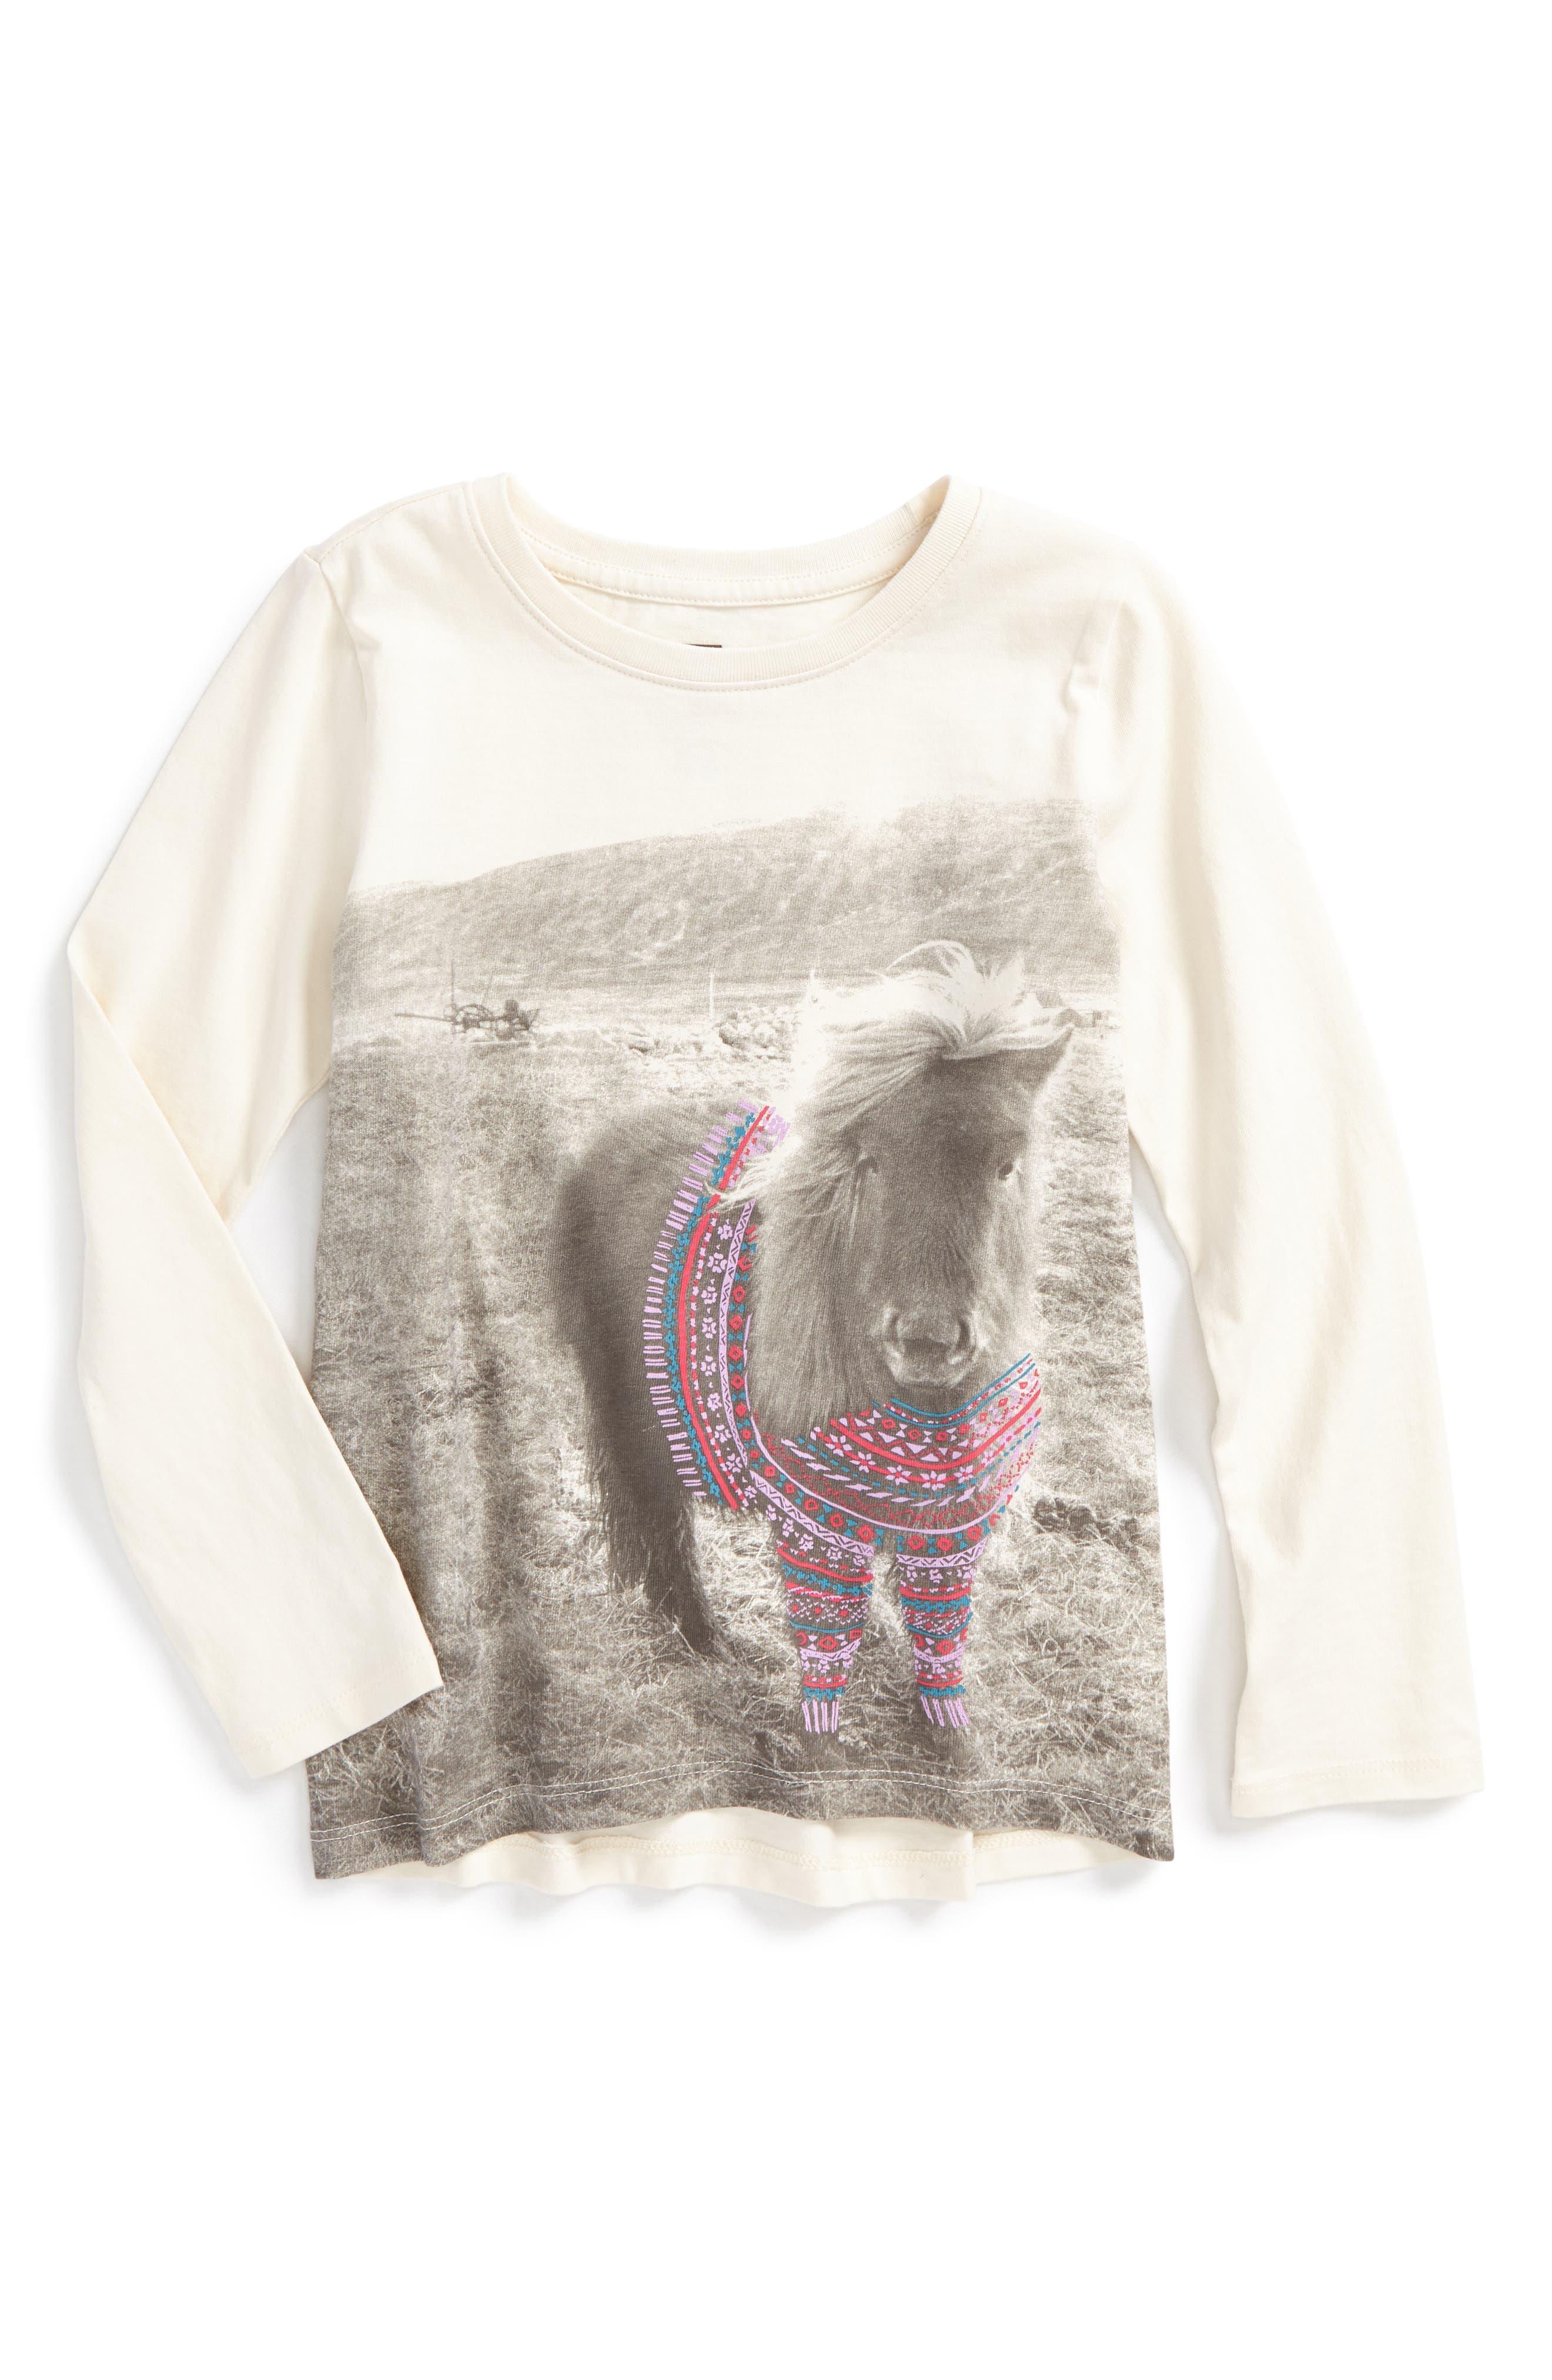 Alternate Image 1 Selected - Tea Collection Shetland Sweater Tee (Toddler Girls, Little Girls & Big Girls)